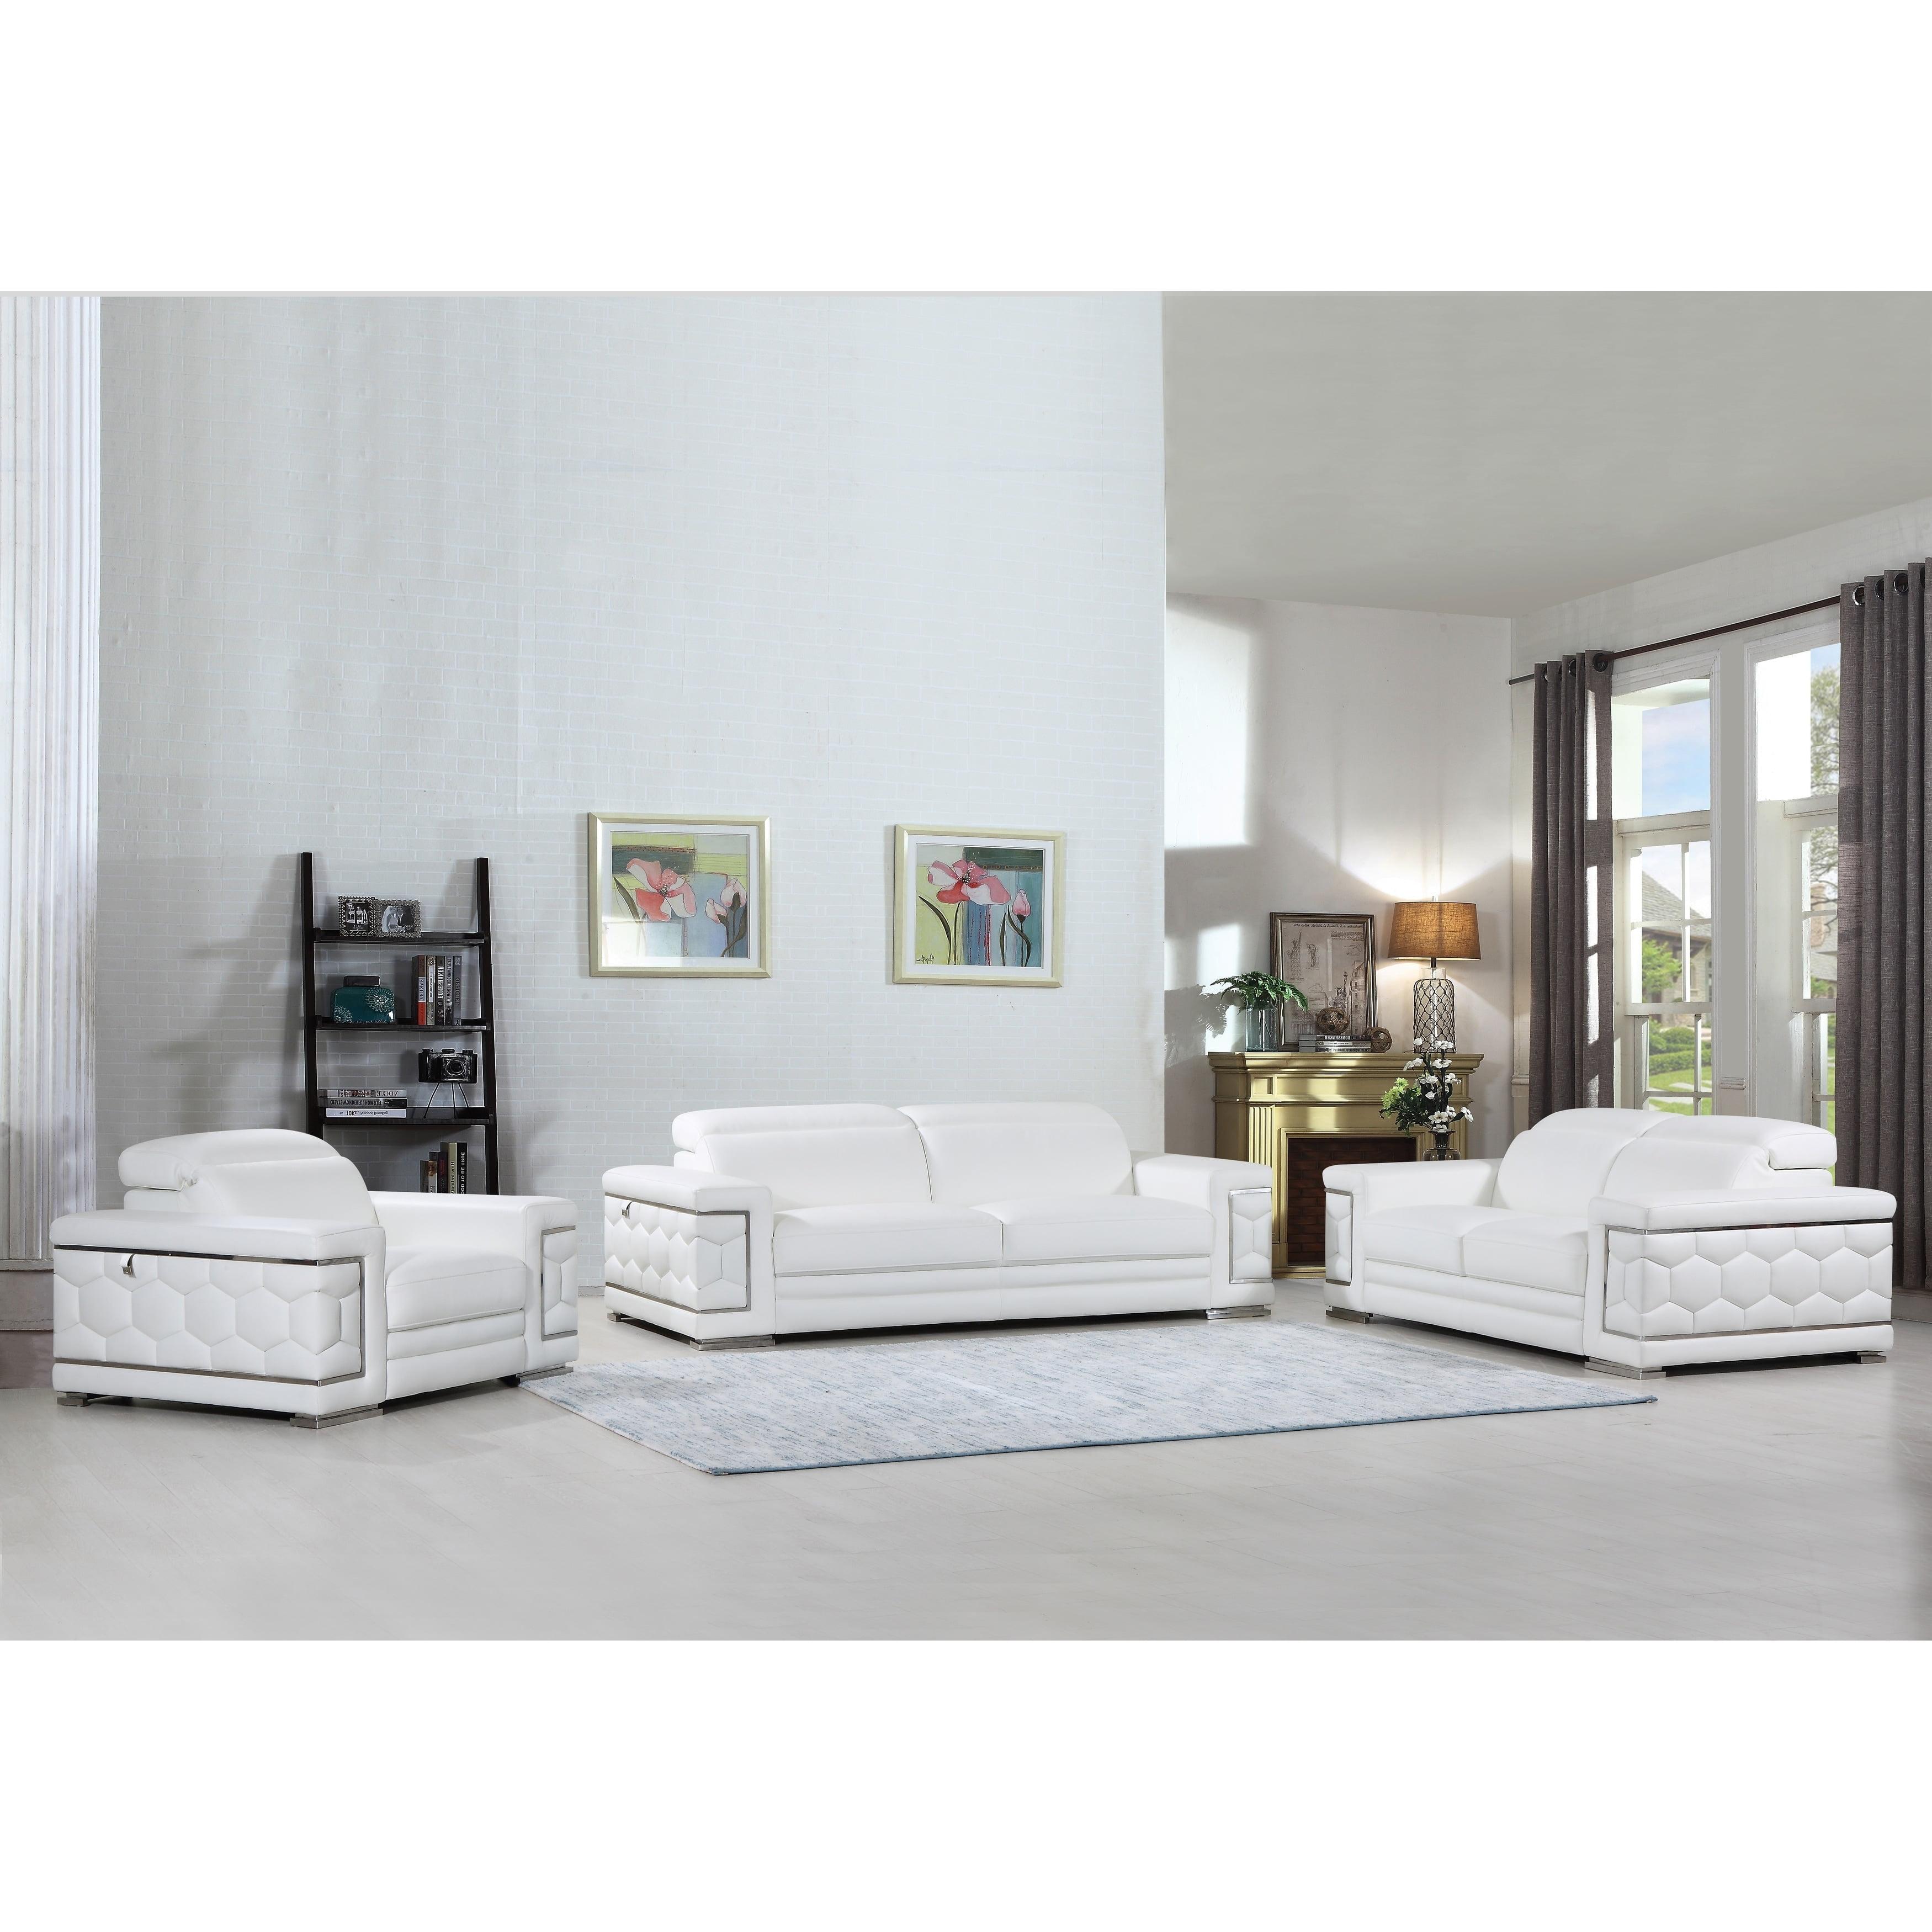 Divanitalia Ferrara Luxury Italian Leather Upholstered